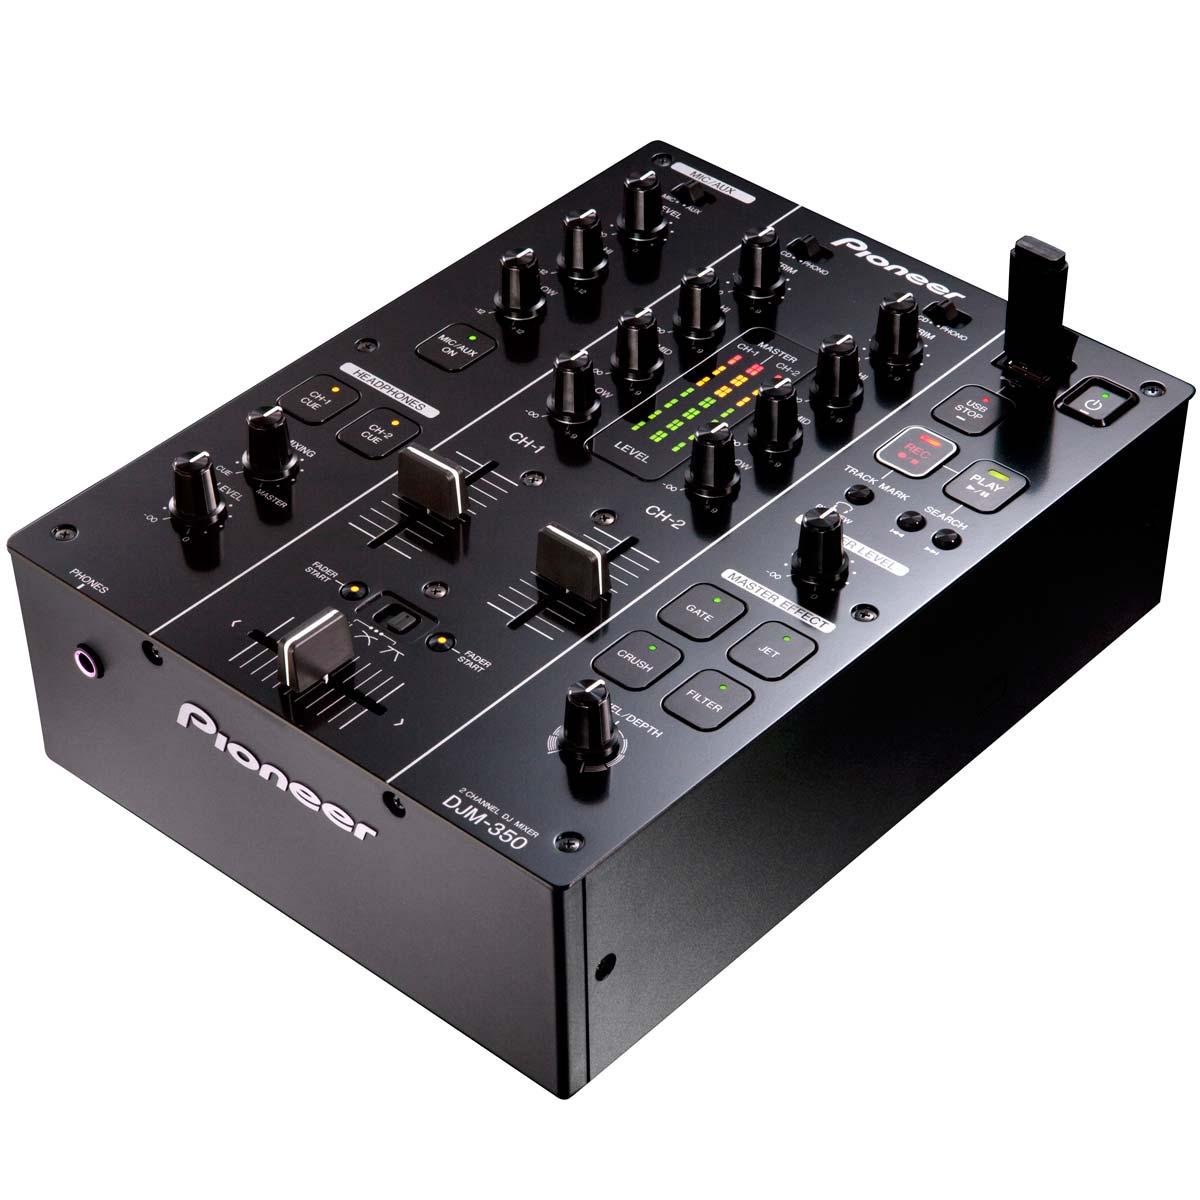 DJM350 - Mixer DJ 2 Canais c/ USB DJM 350 Preto - Pioneer